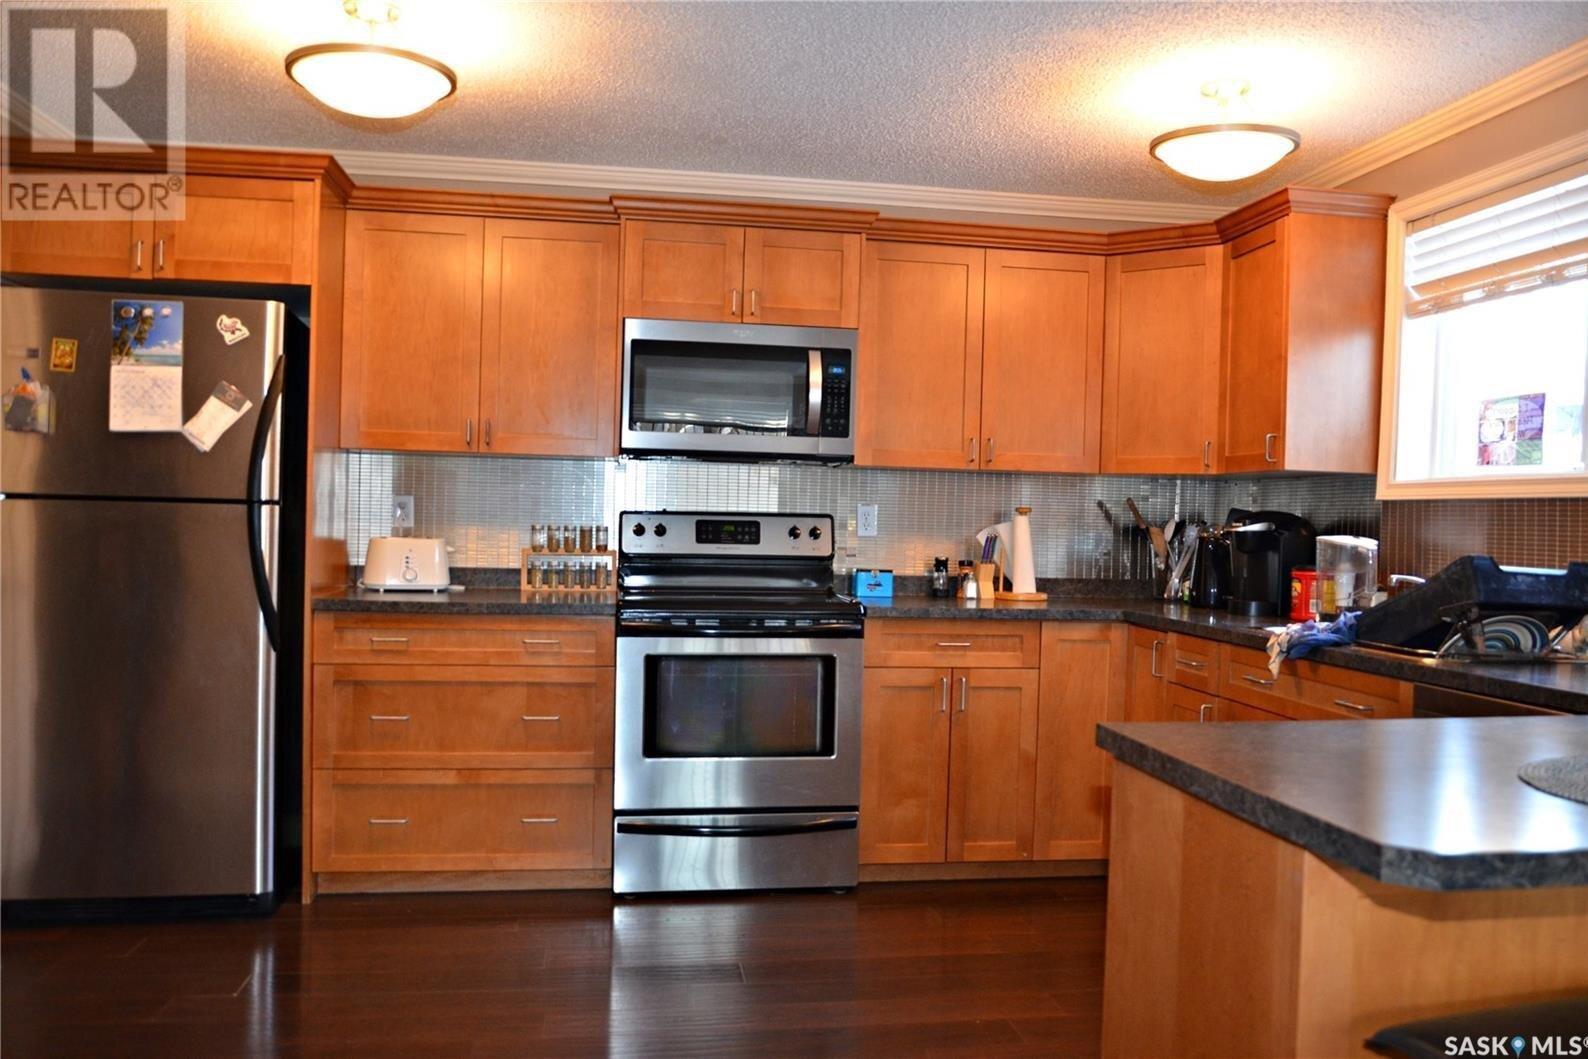 Condo for sale at 521 18th St W Unit 101 Saskatoon Saskatchewan - MLS: SK834234